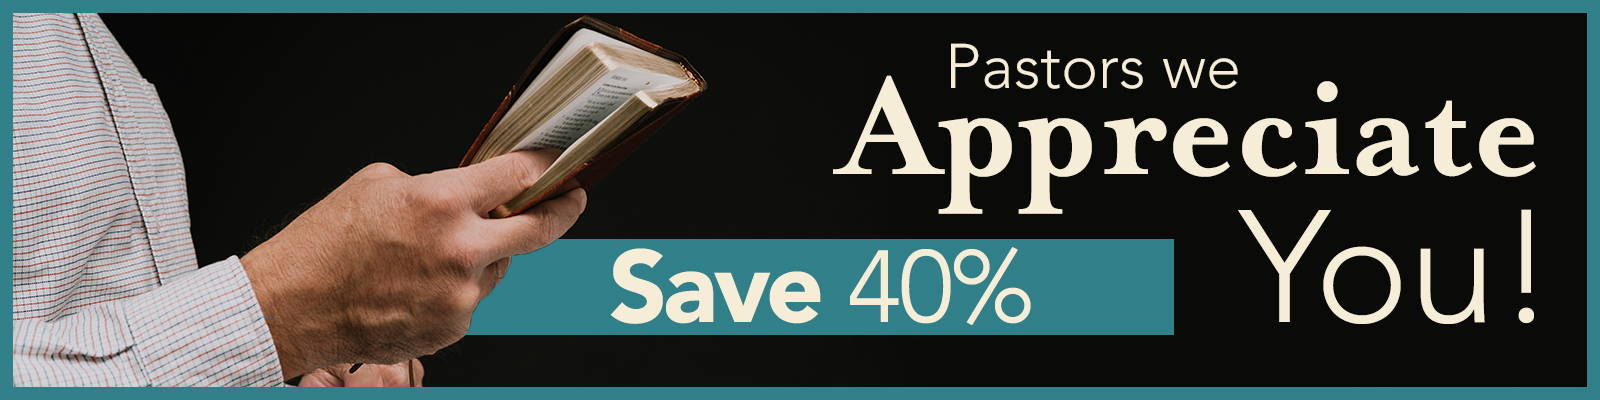 Pastors we appreciate you - Save 40%